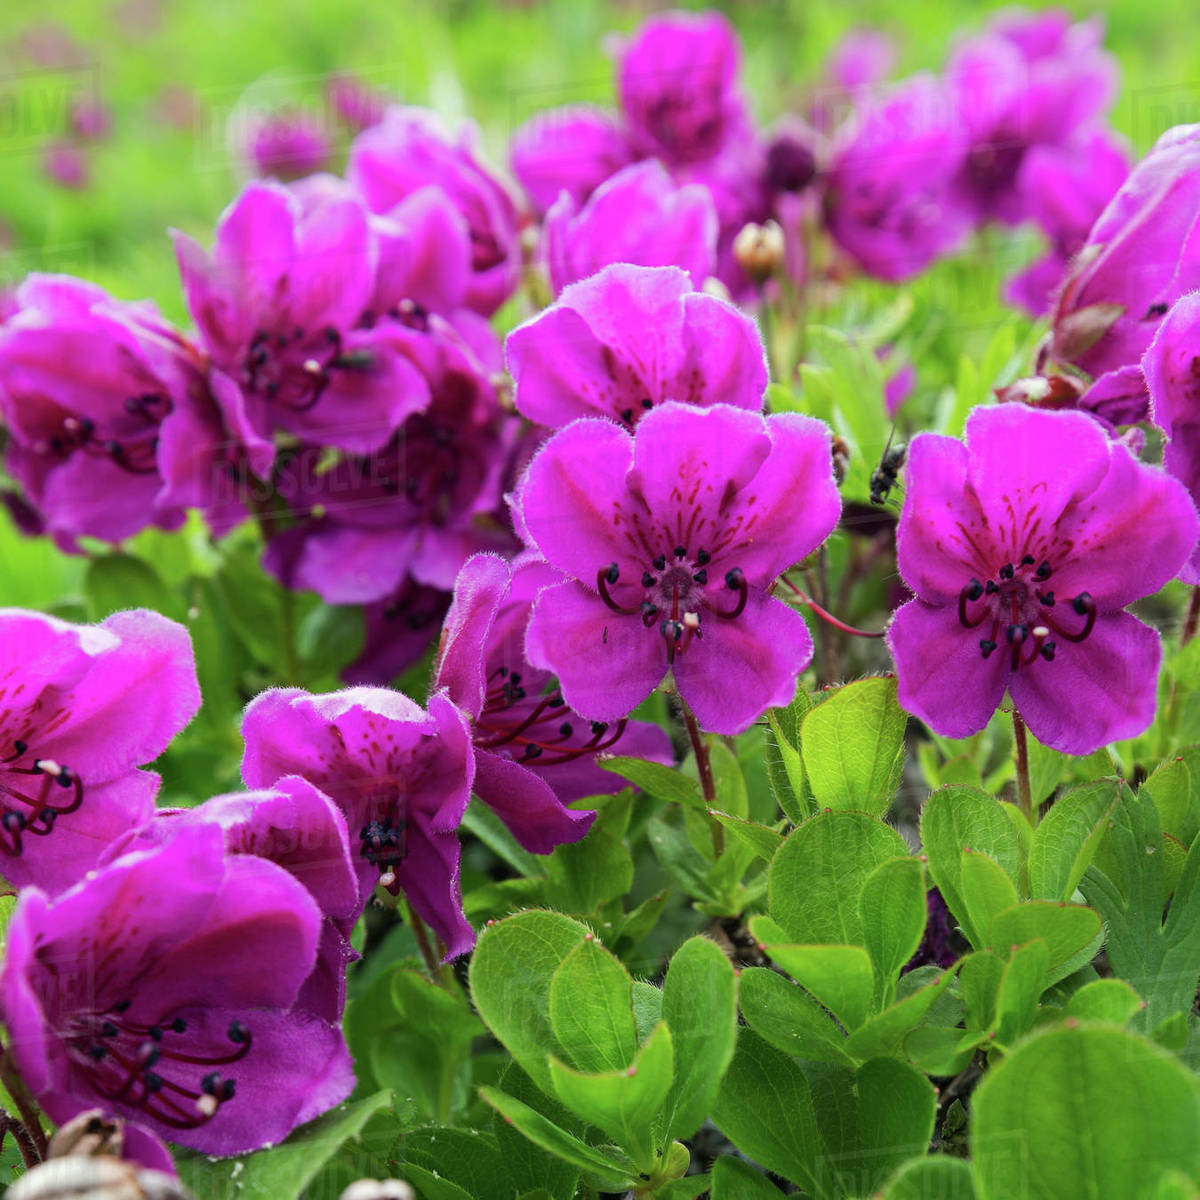 Beautiful flora of Kamchatka Peninsula: wild alpine purple flowers Rhododendron Camtschaticum in summer season. Eurasia, Russian Far East, Kamchatka Region. Royalty-free stock photo